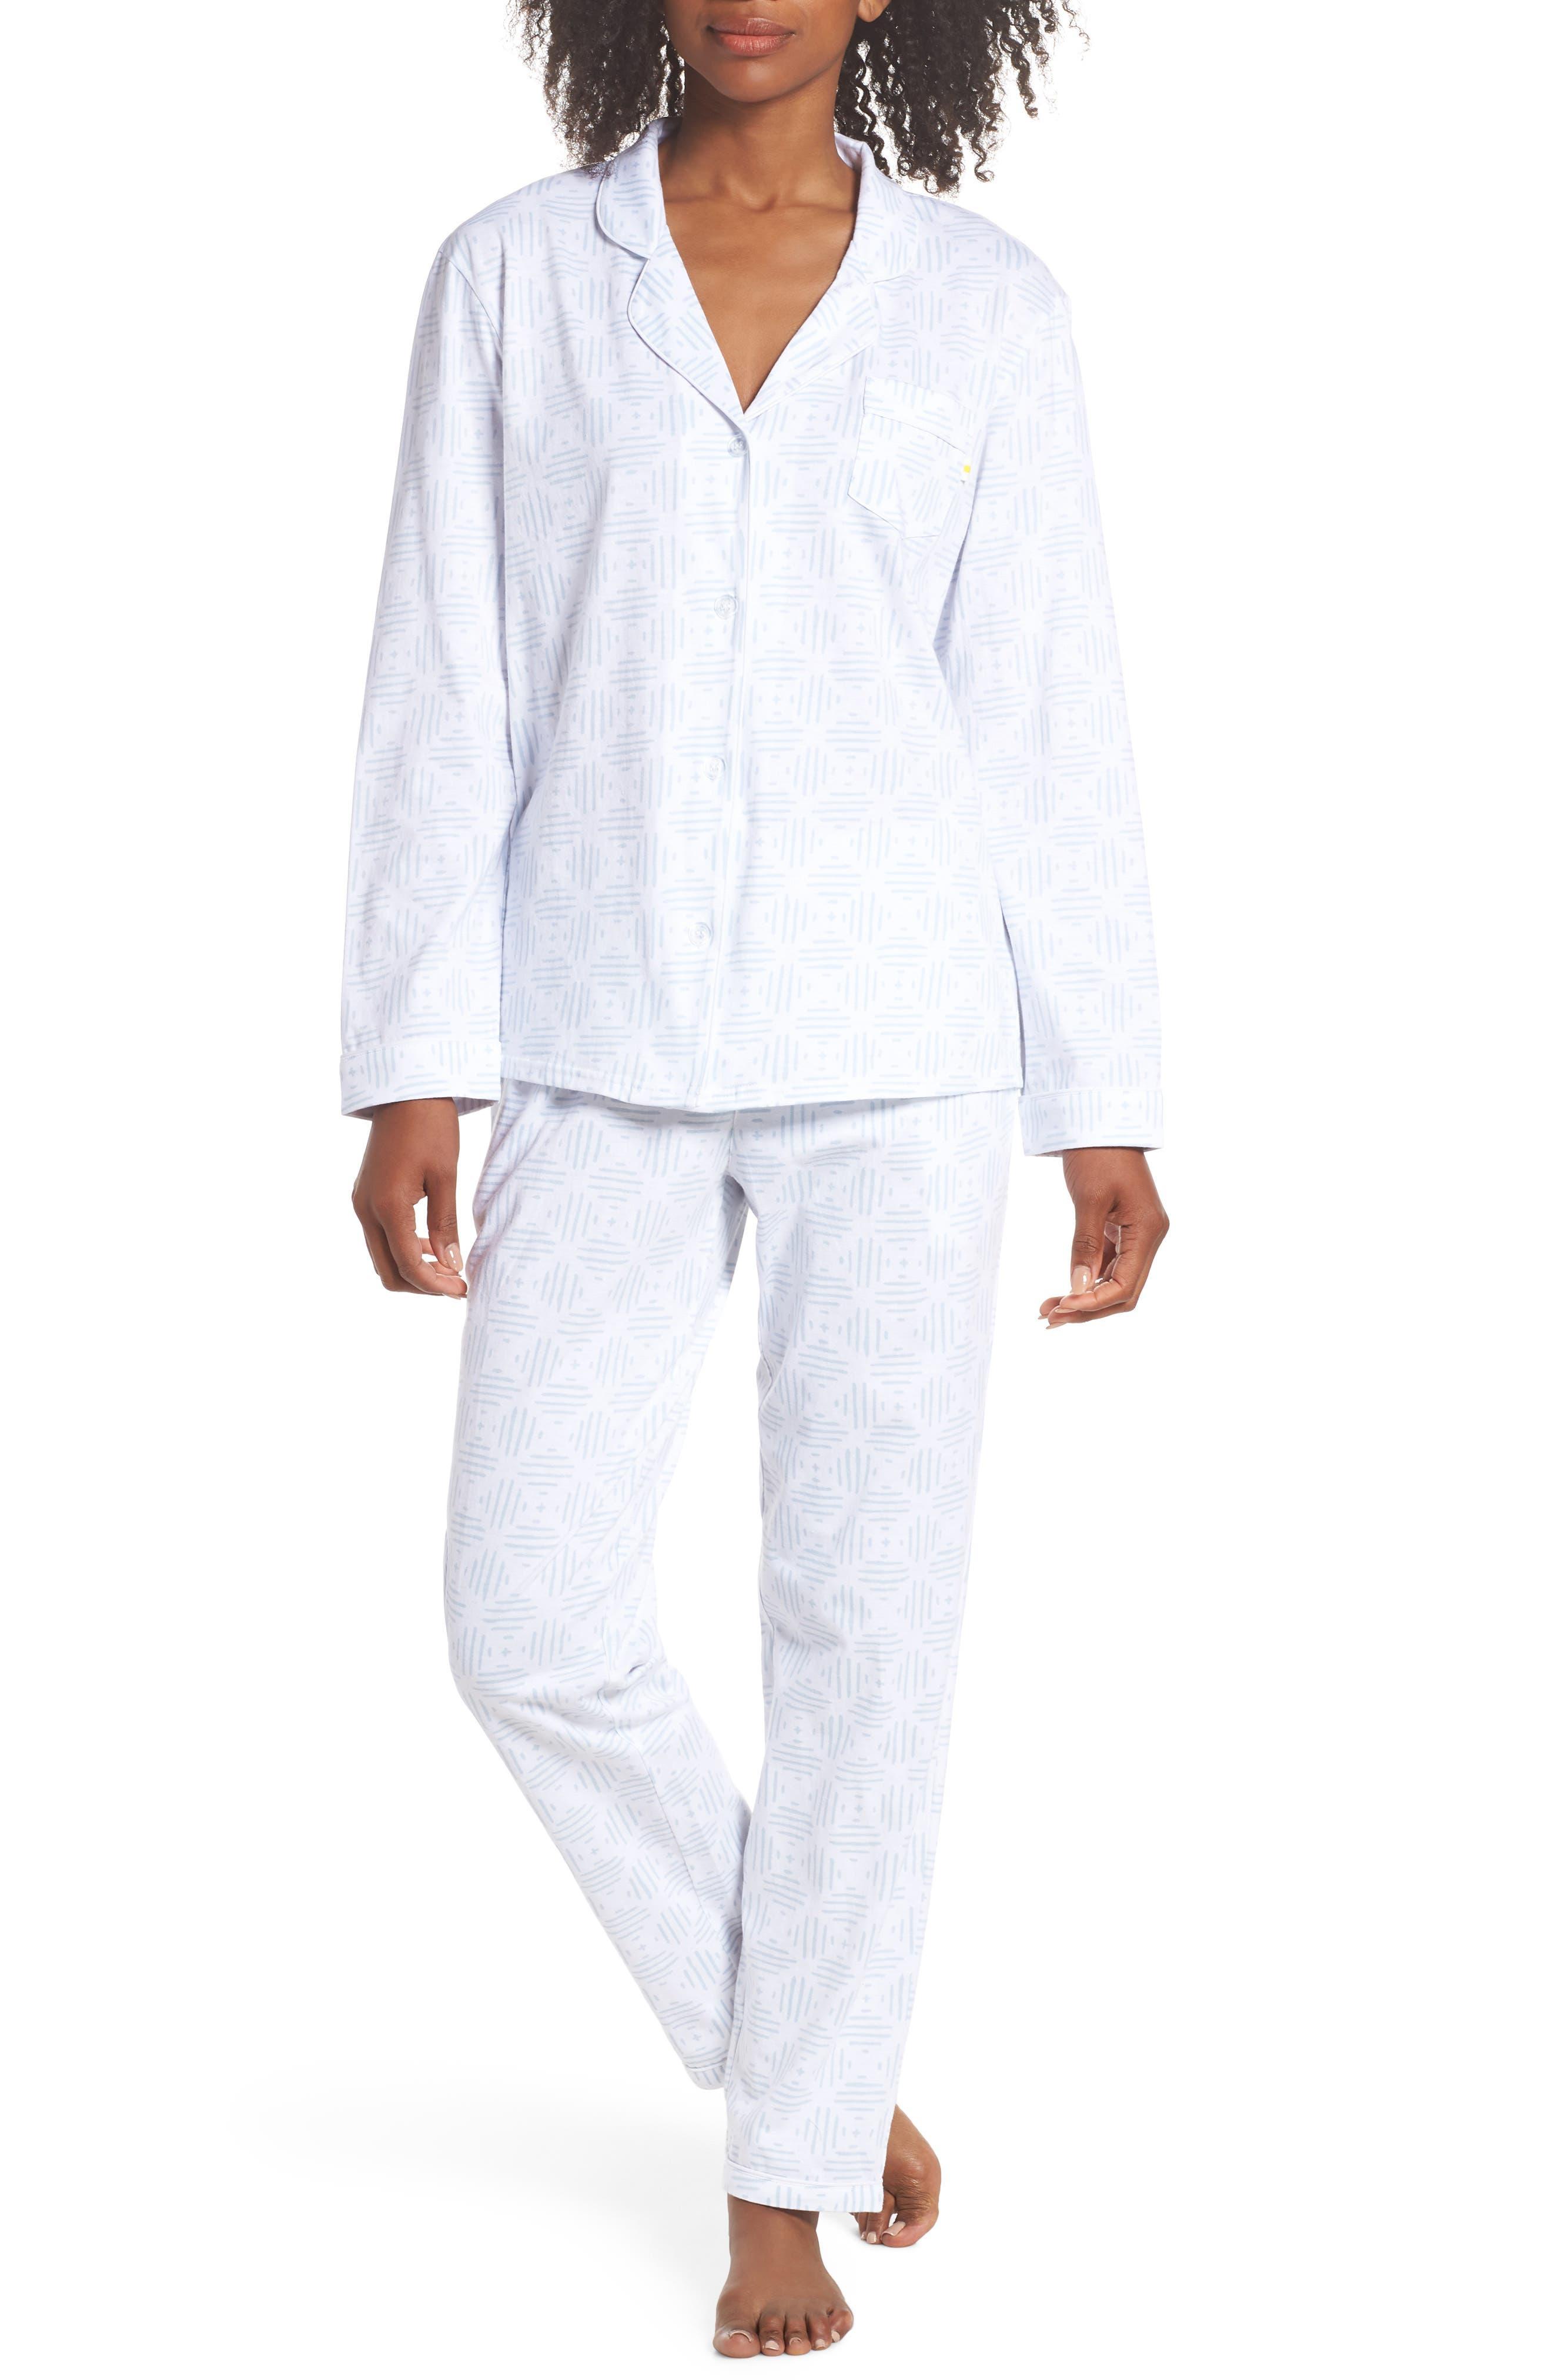 Moroccan Tile Pajamas,                             Main thumbnail 1, color,                             100